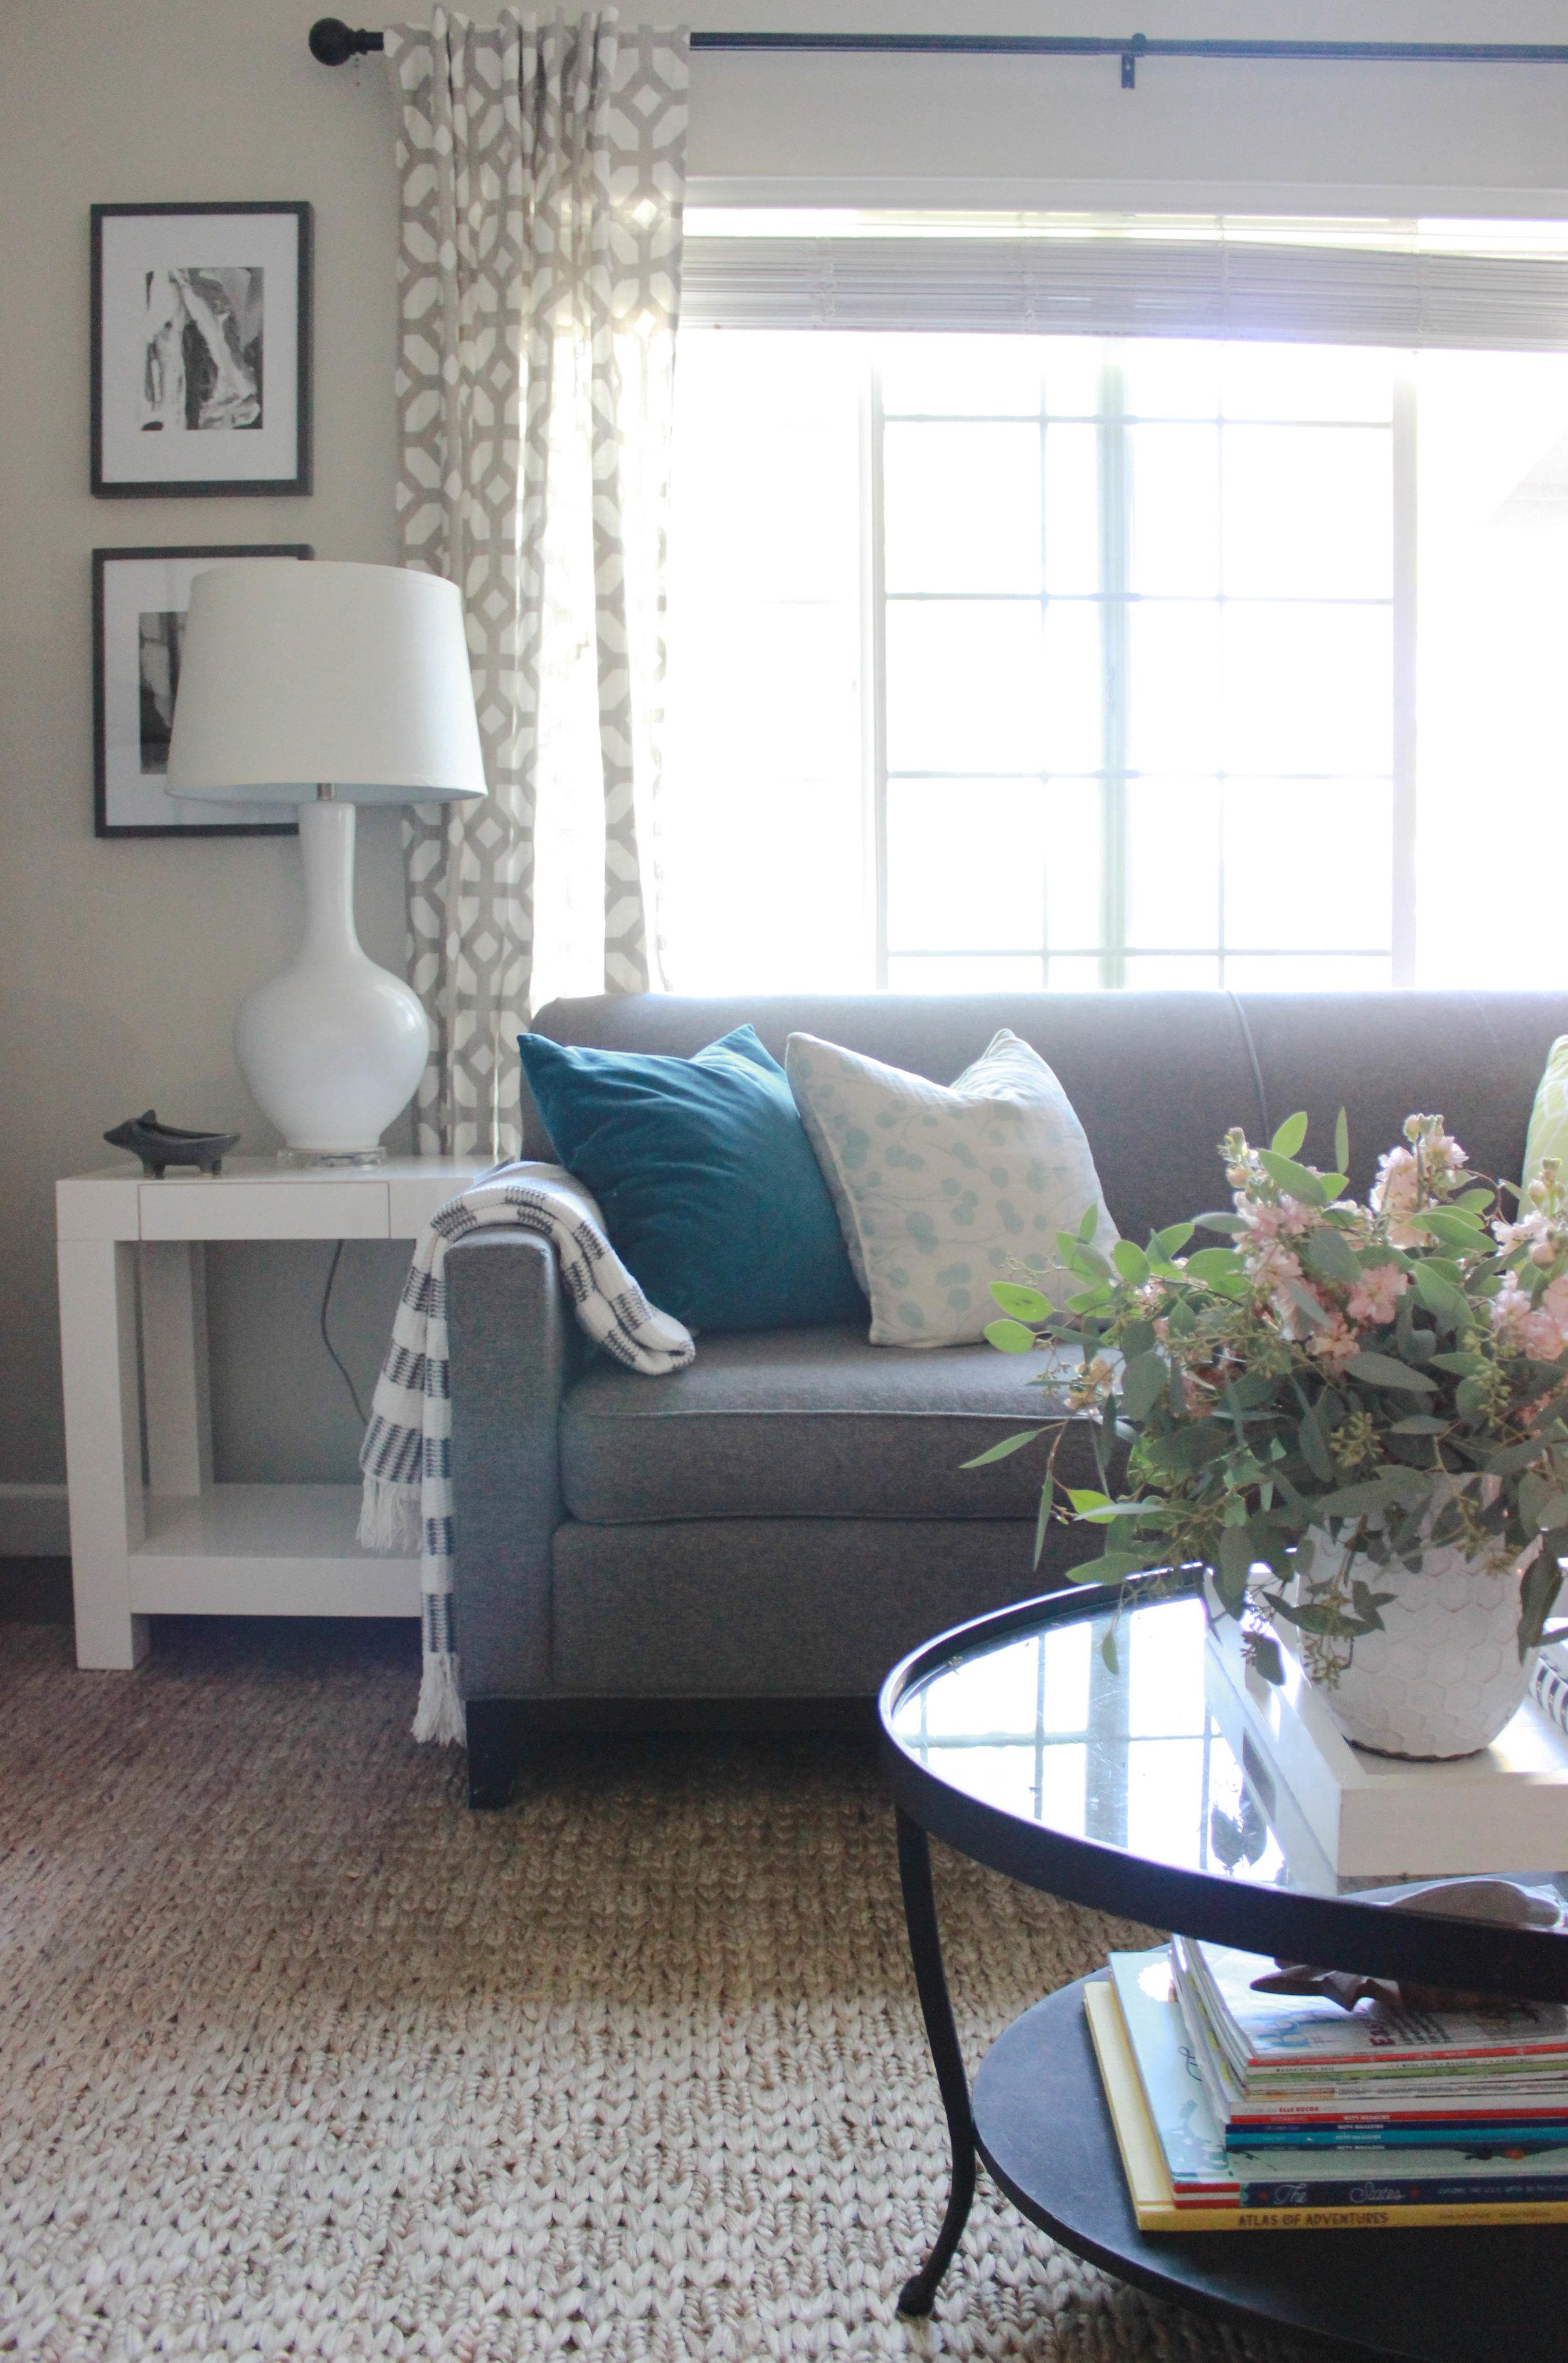 Living Room Update Jute Rug Addition Addiction Katrina Blair Interior Design Small Home Style Modern Livingkatrina Blair